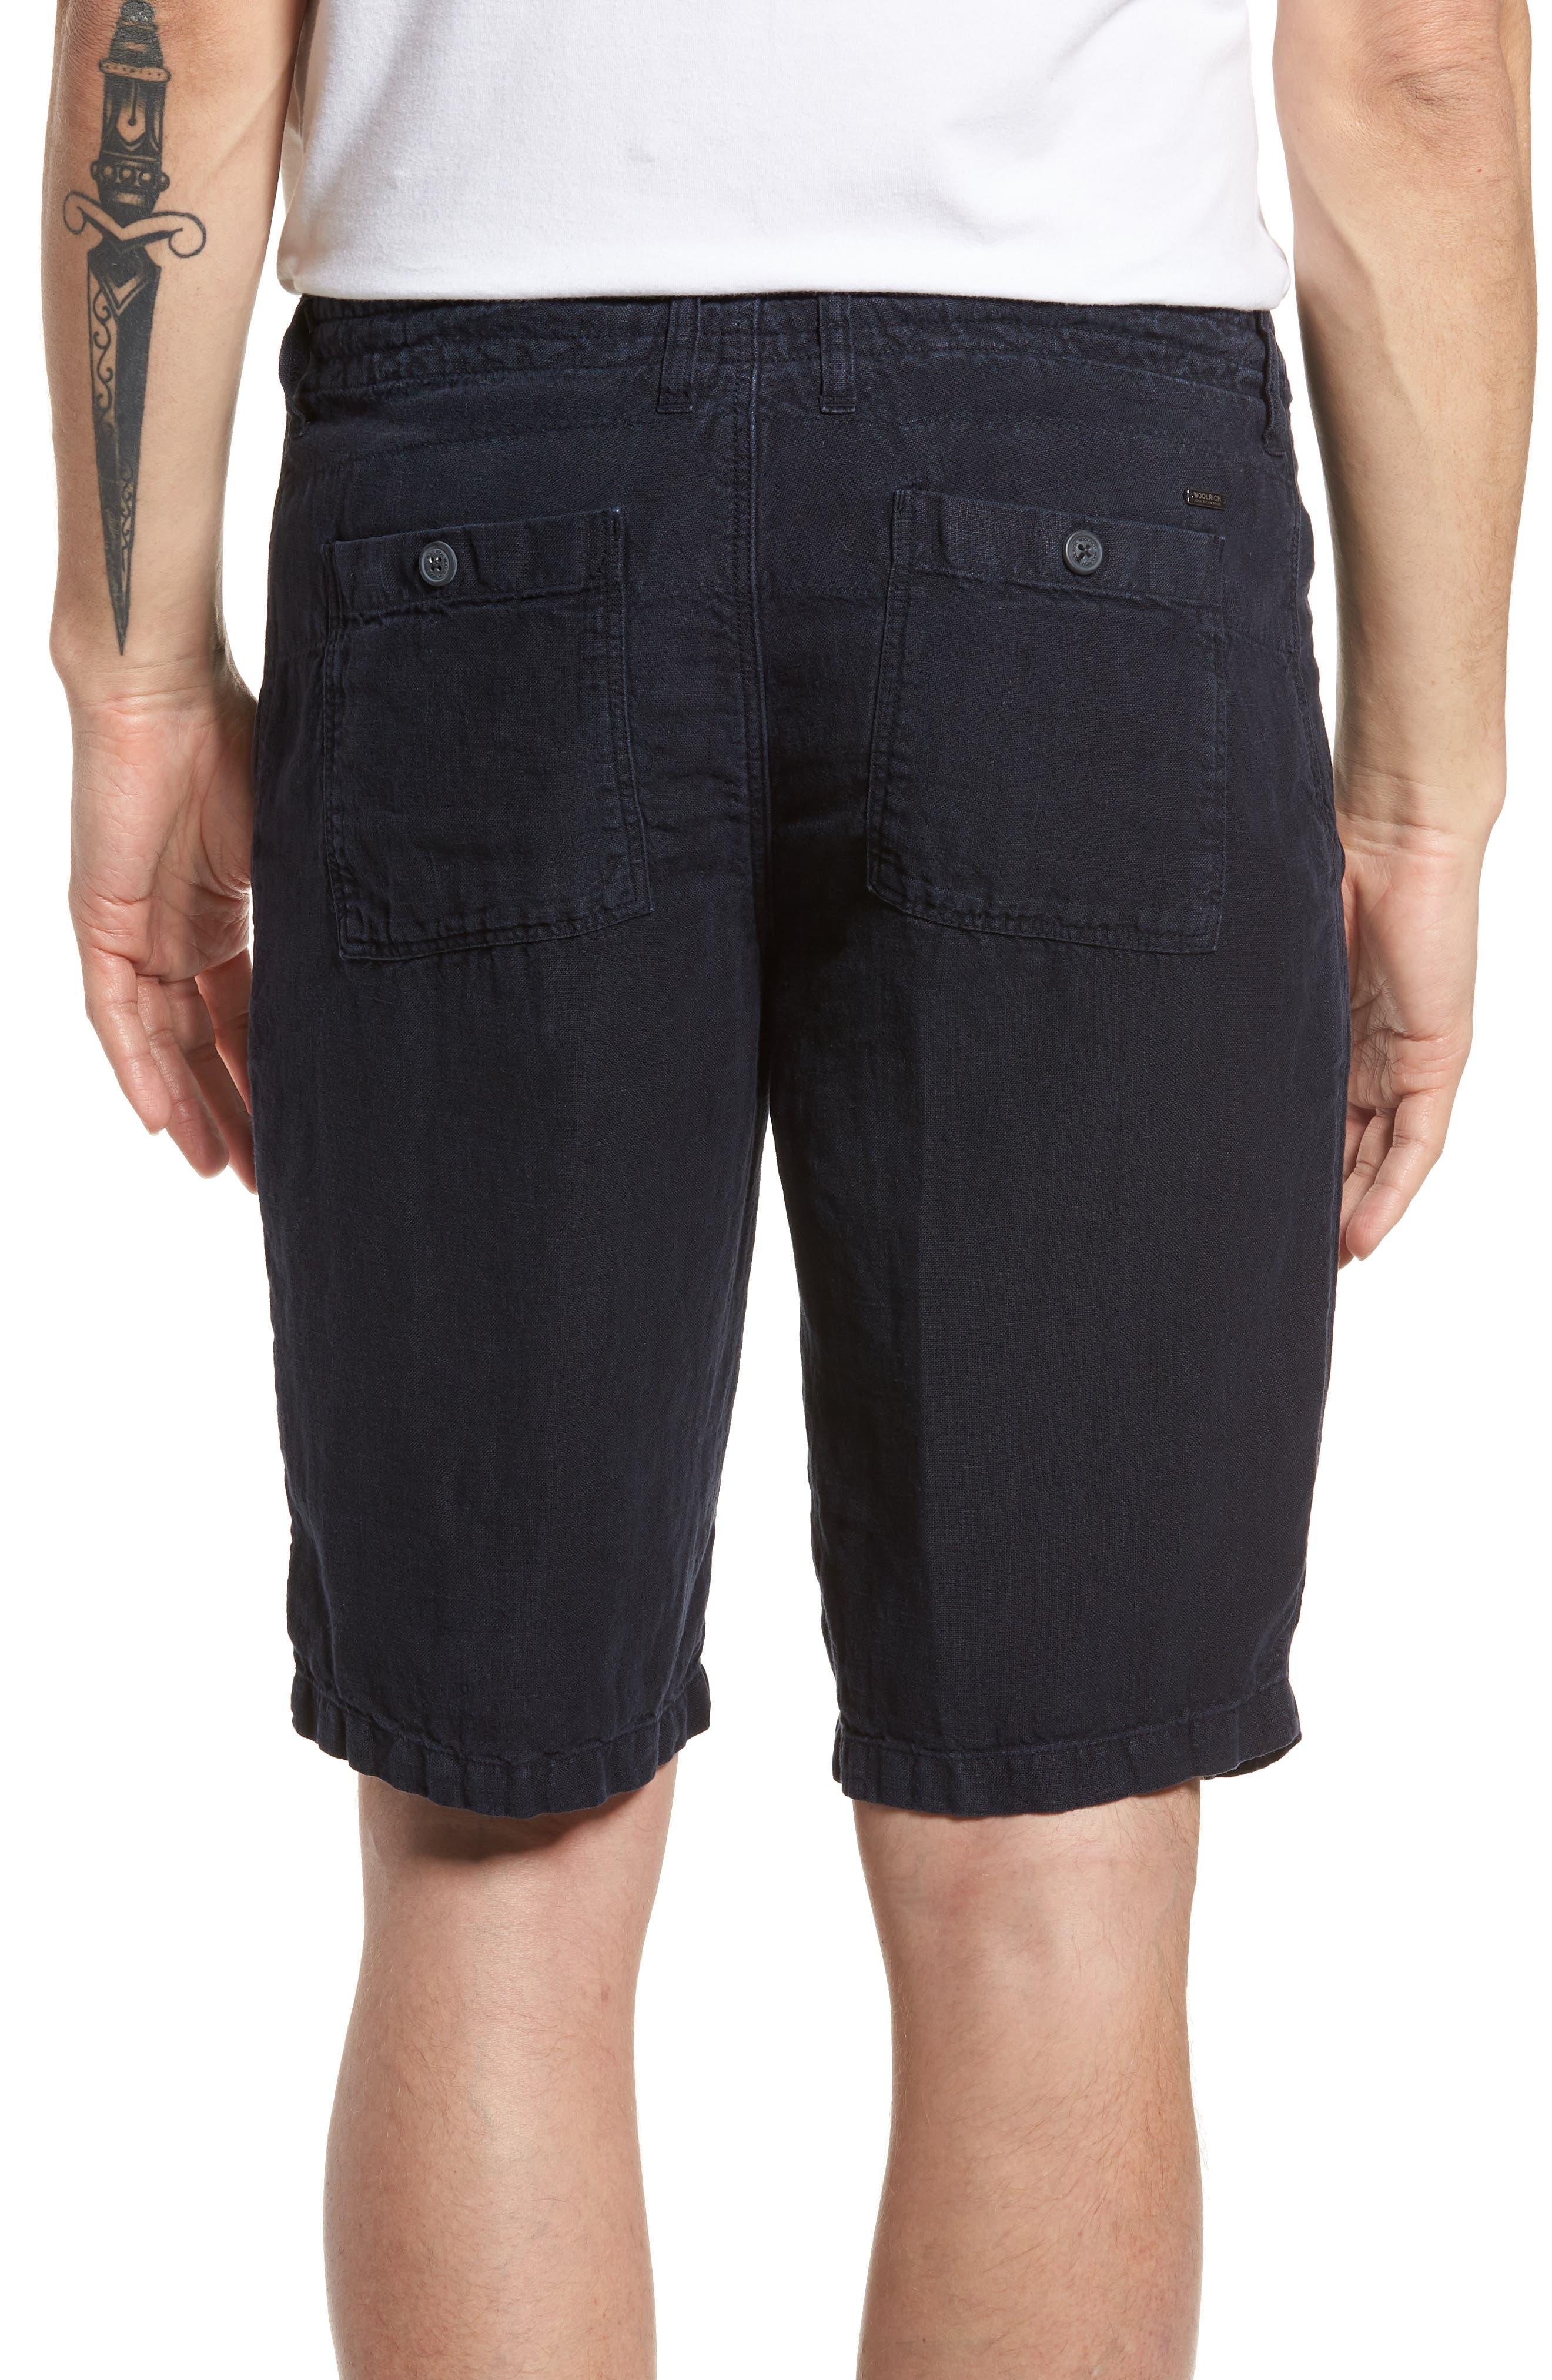 & Bros. Linen Shorts,                             Alternate thumbnail 2, color,                             Alpine Navy